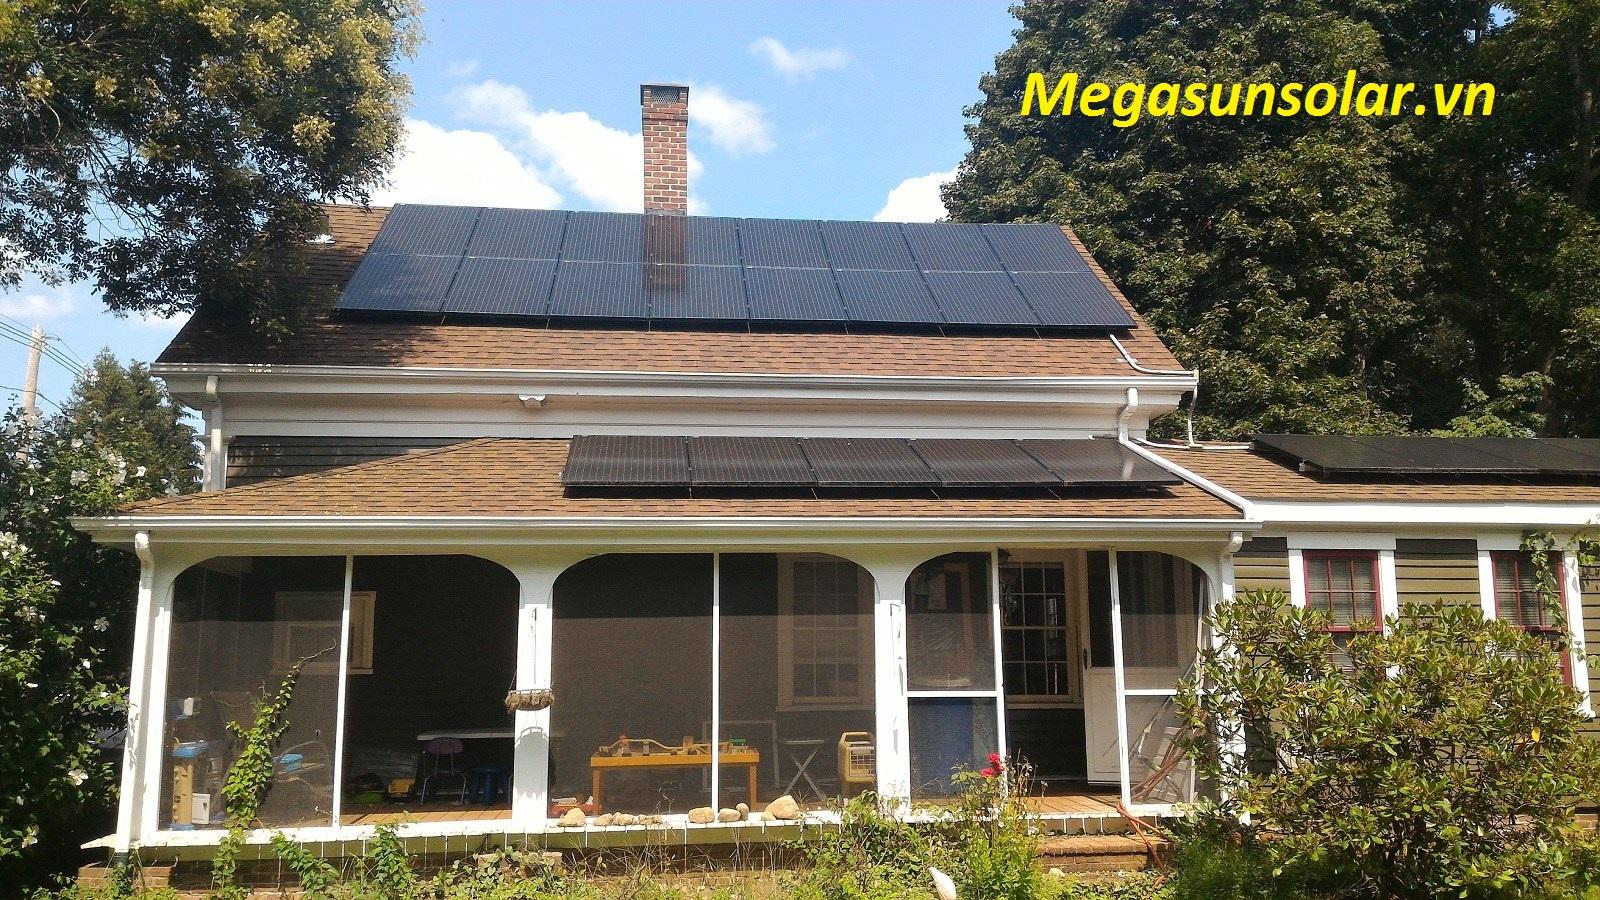 Điện năng lượng mặt trời 5kw Megasun